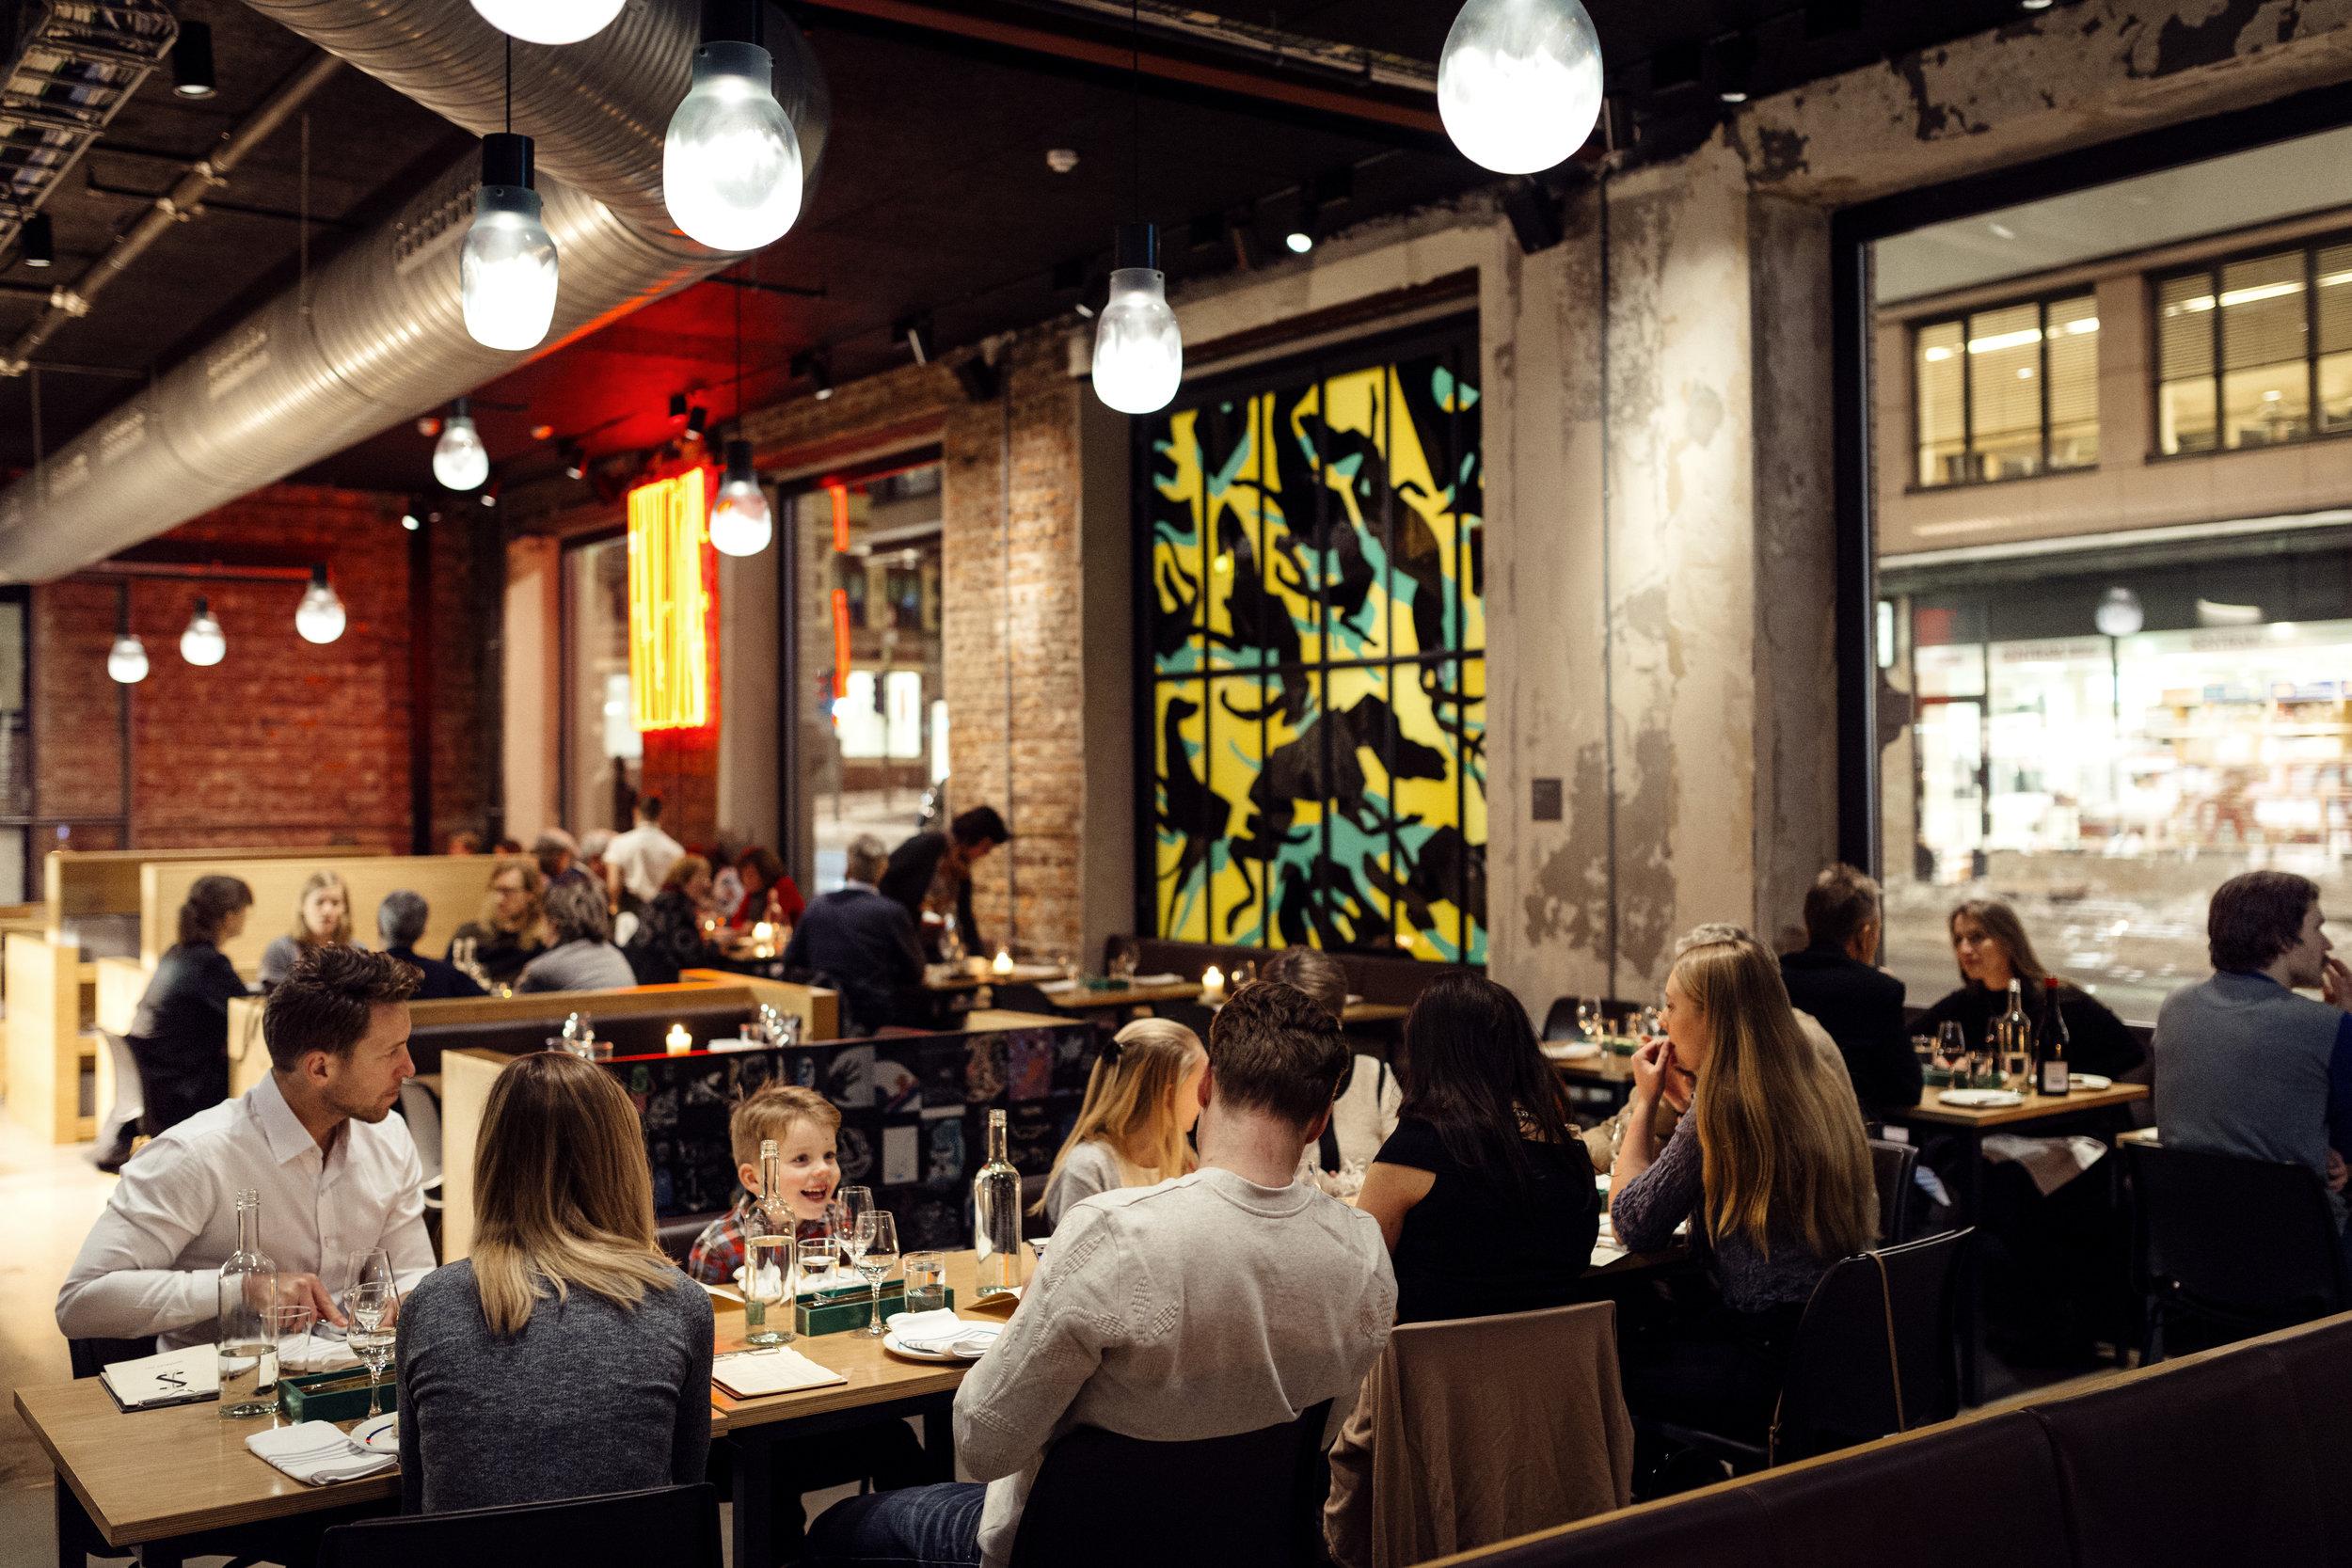 lavaoslo-Restaurant-kafe-sentralen mat-valgmuligheter-bar-sal-oslo